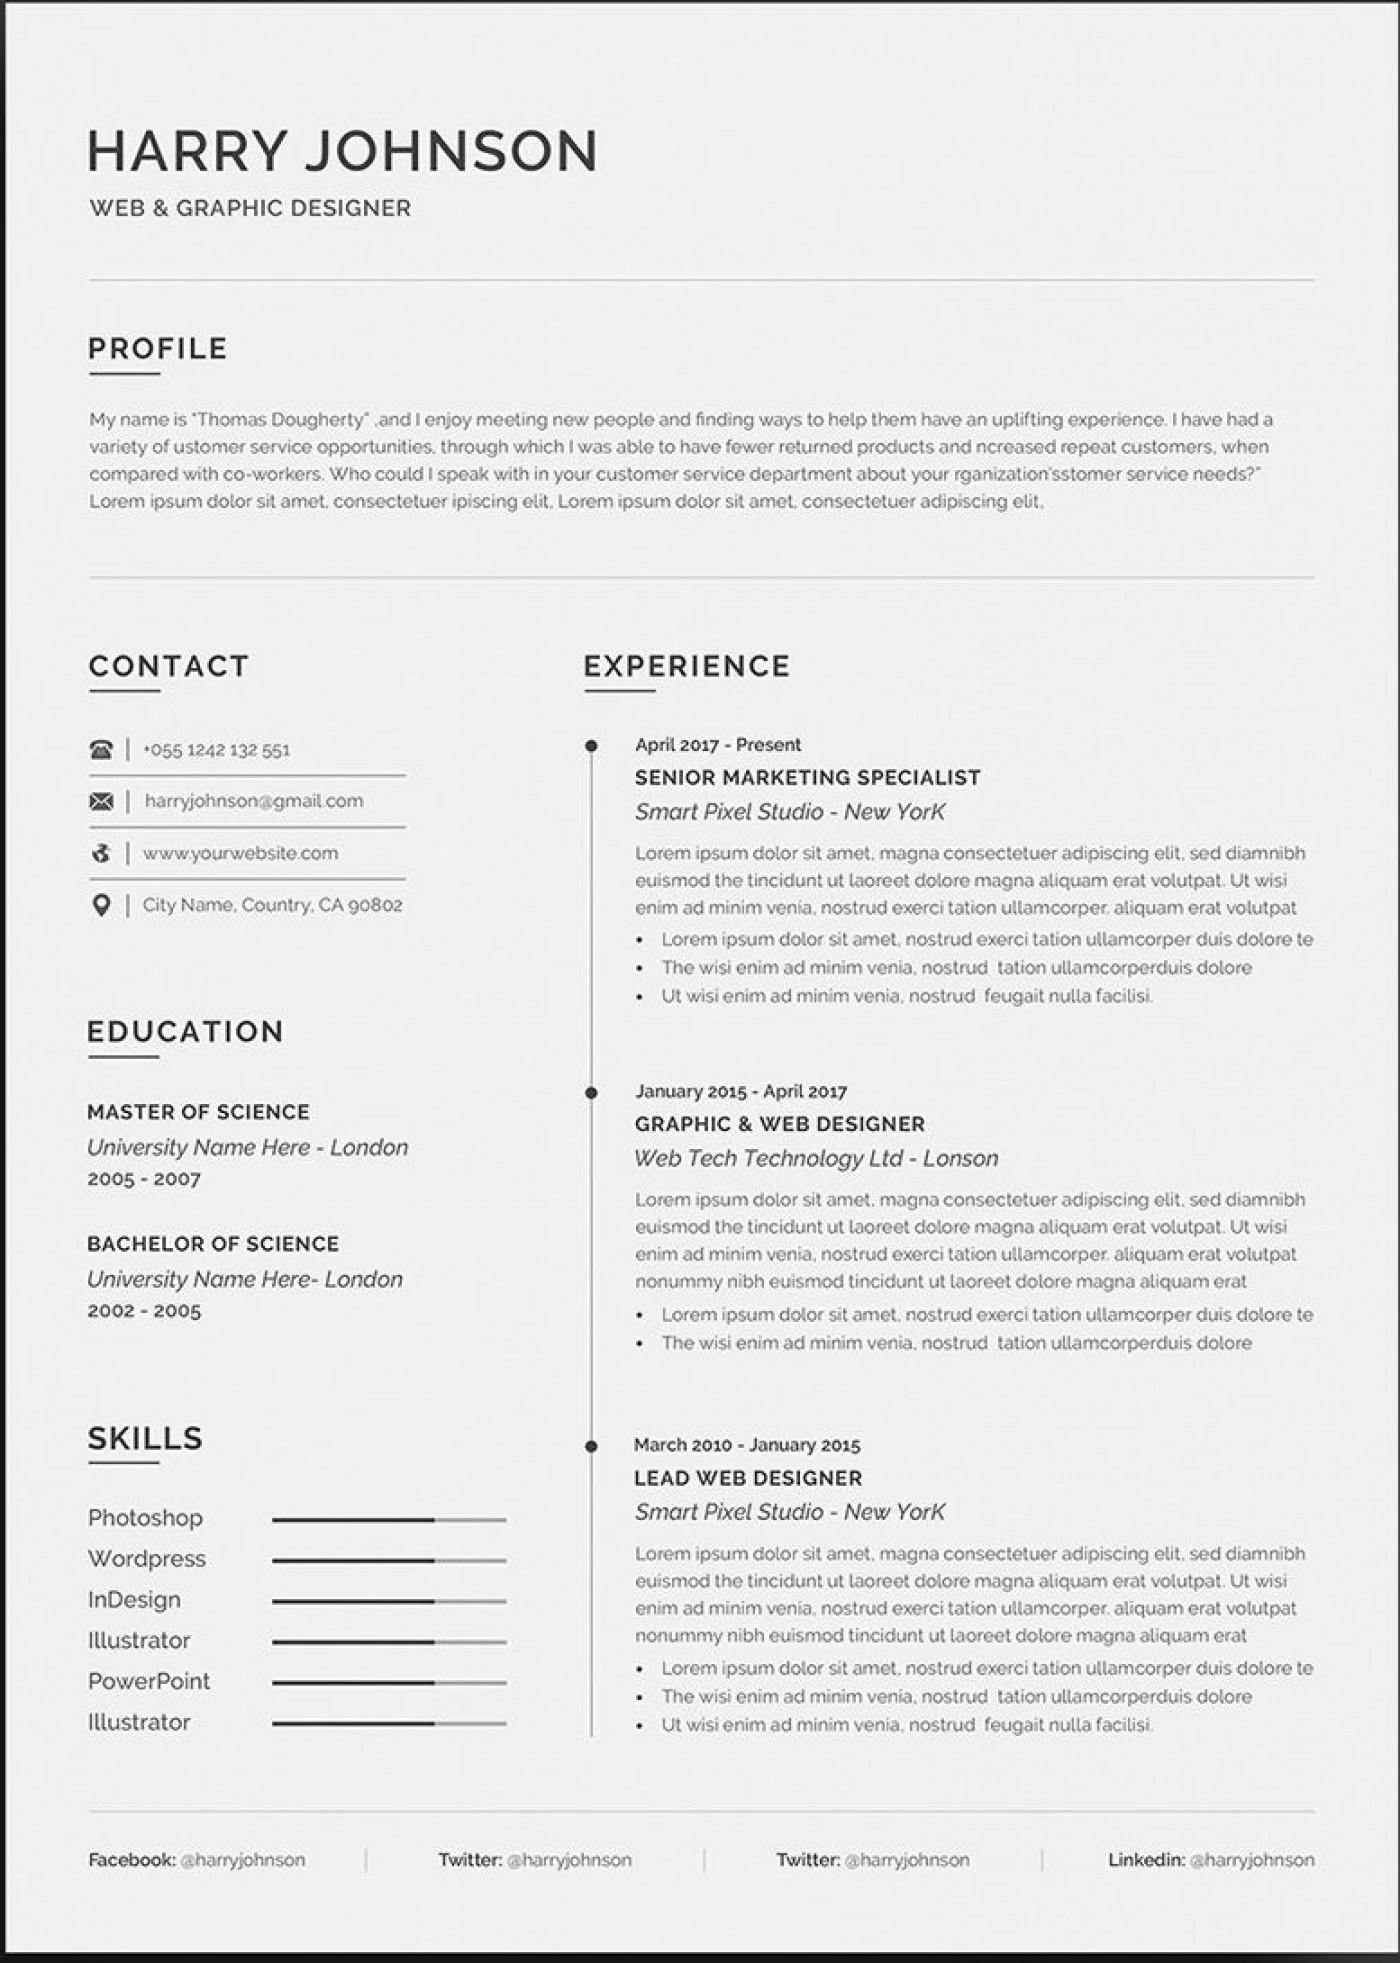 003 Wonderful Resume Microsoft Word Template Image  Cv/resume Design Tutorial With Federal Download1400